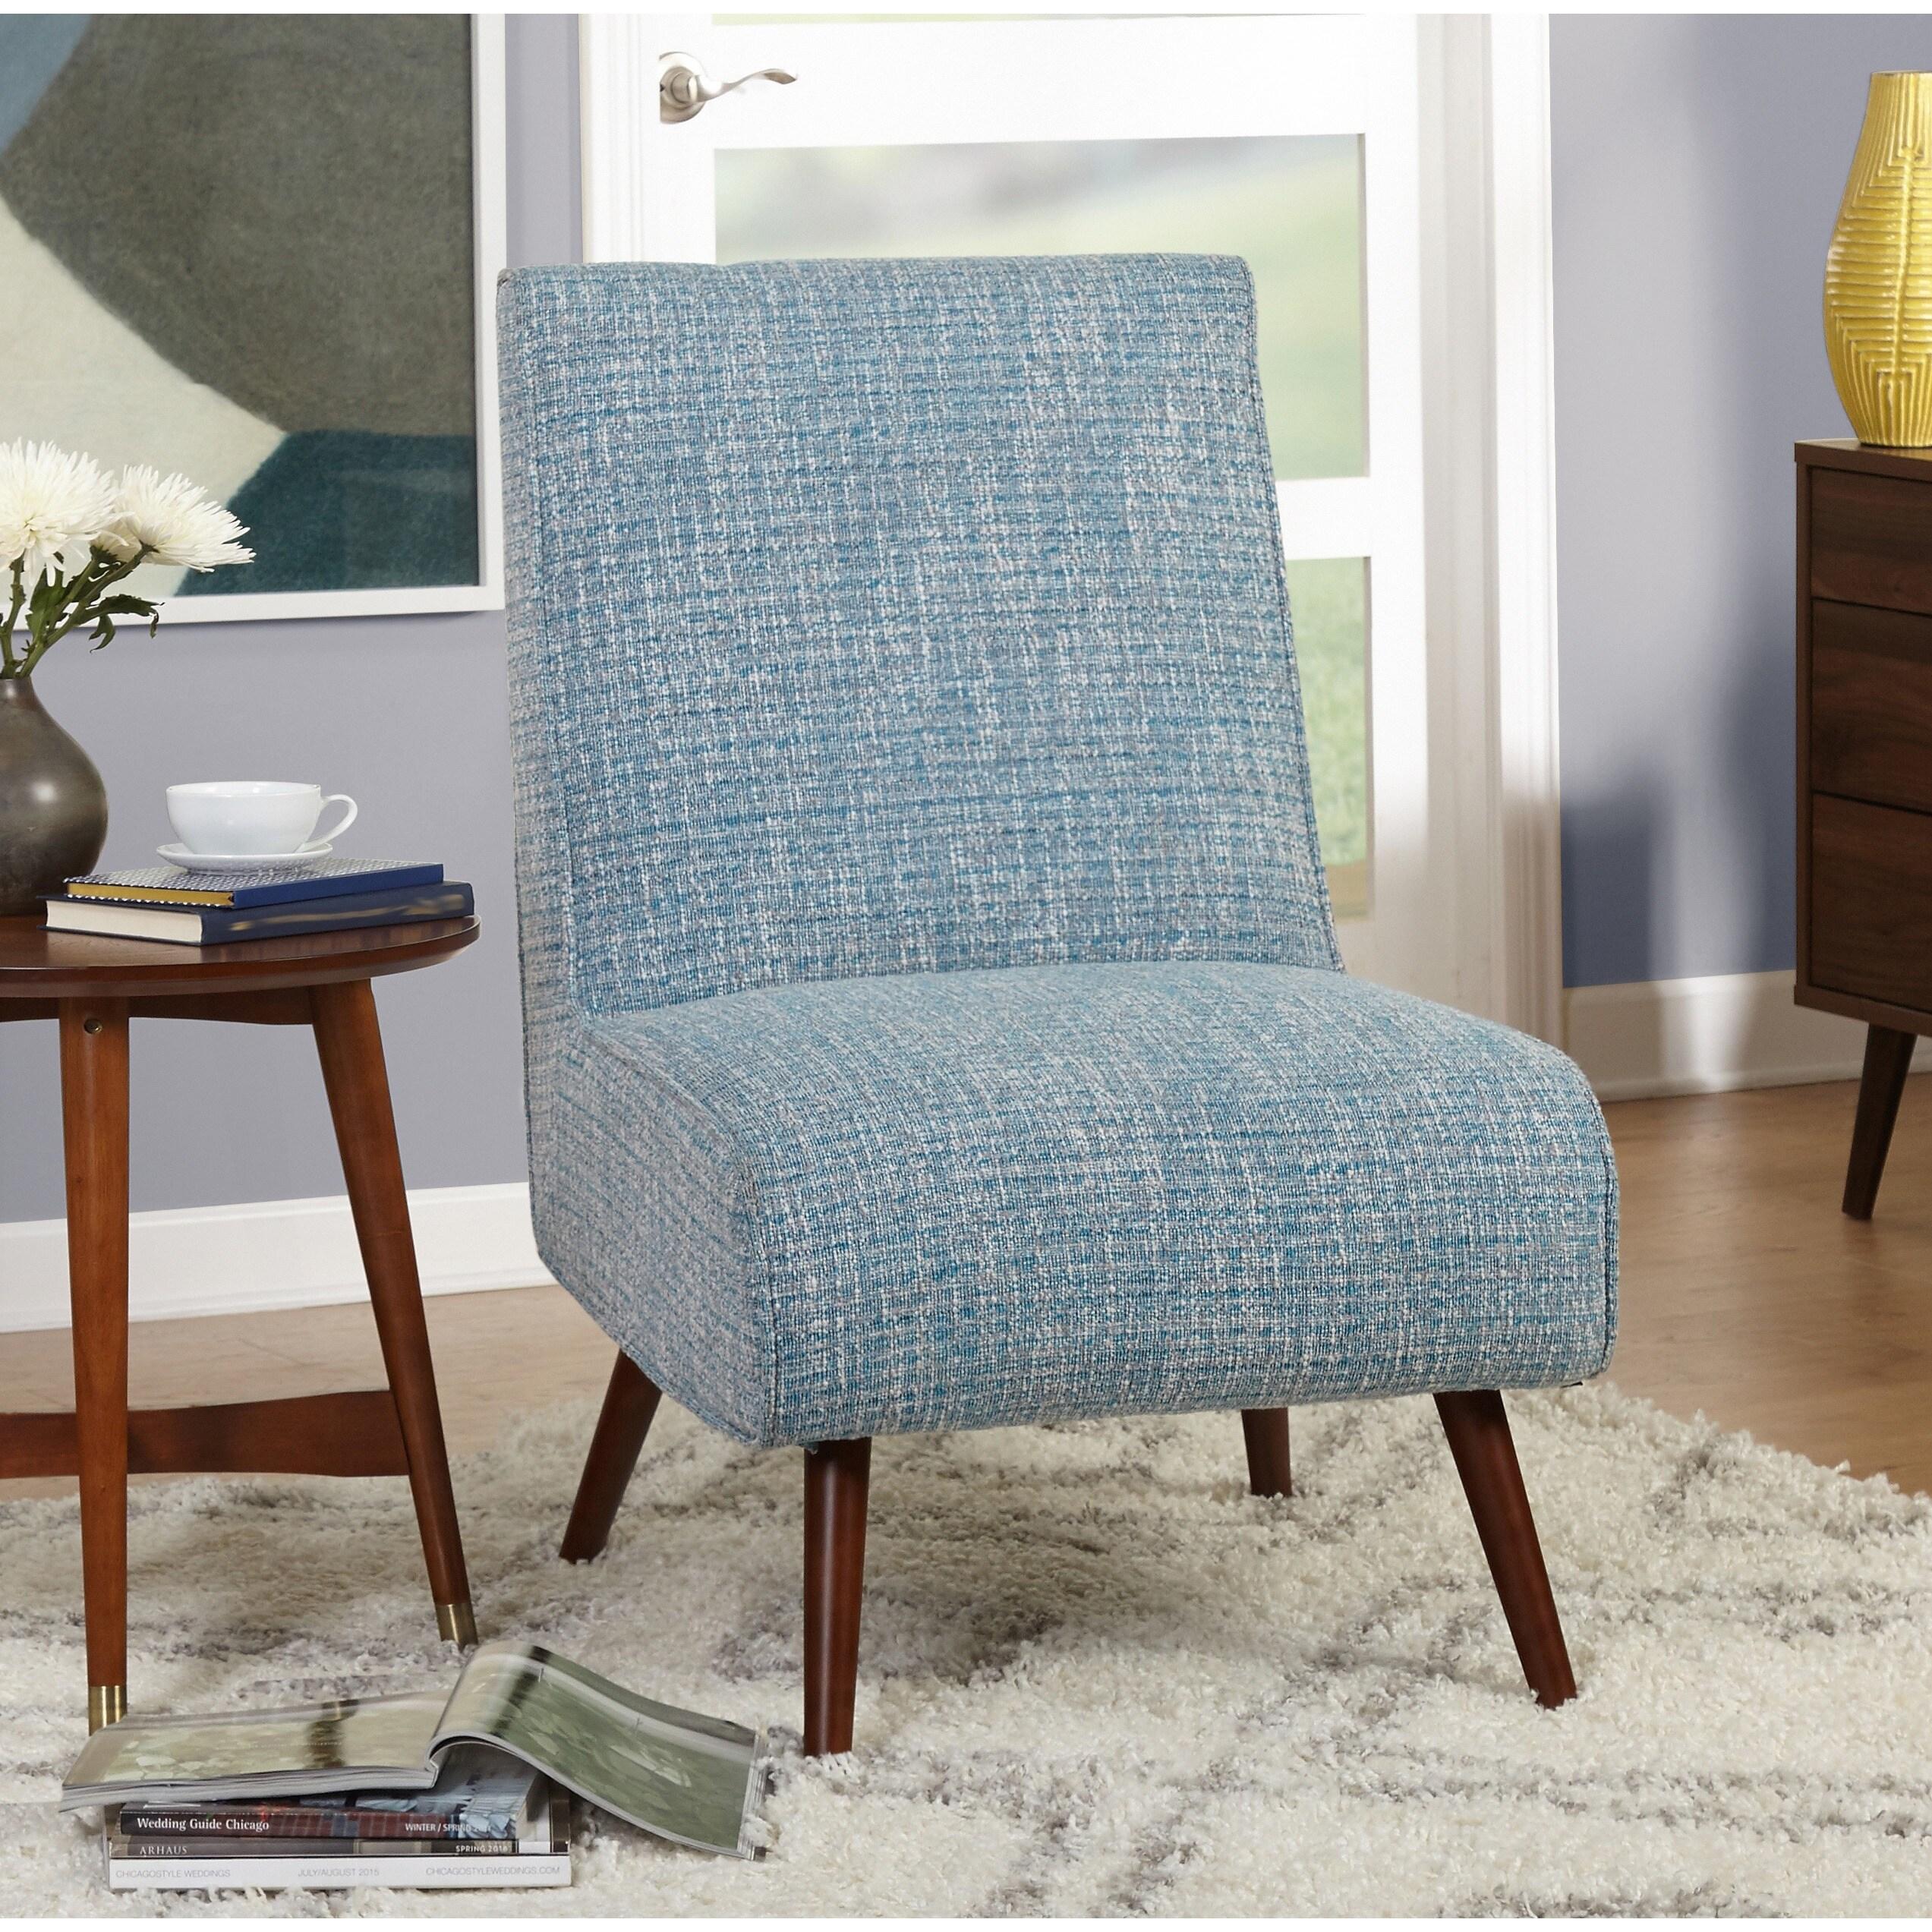 Stupendous Simple Living Mid Century Malone Blue Accent Chair Download Free Architecture Designs Embacsunscenecom